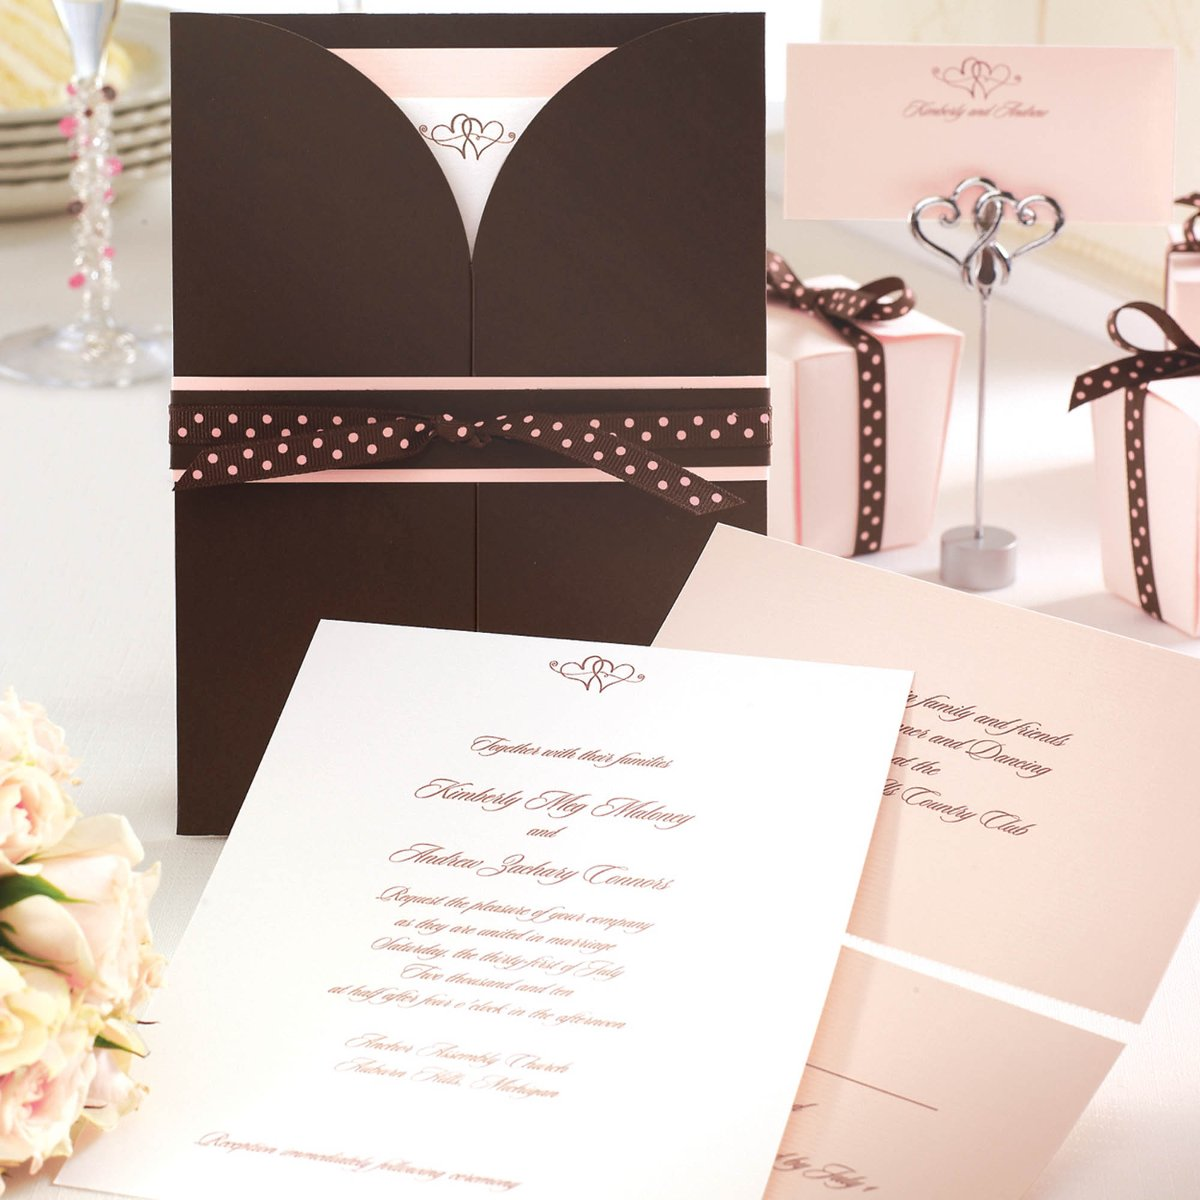 Wedding E Invitations: Wedding Invitations, Wedding Invitations Photos By